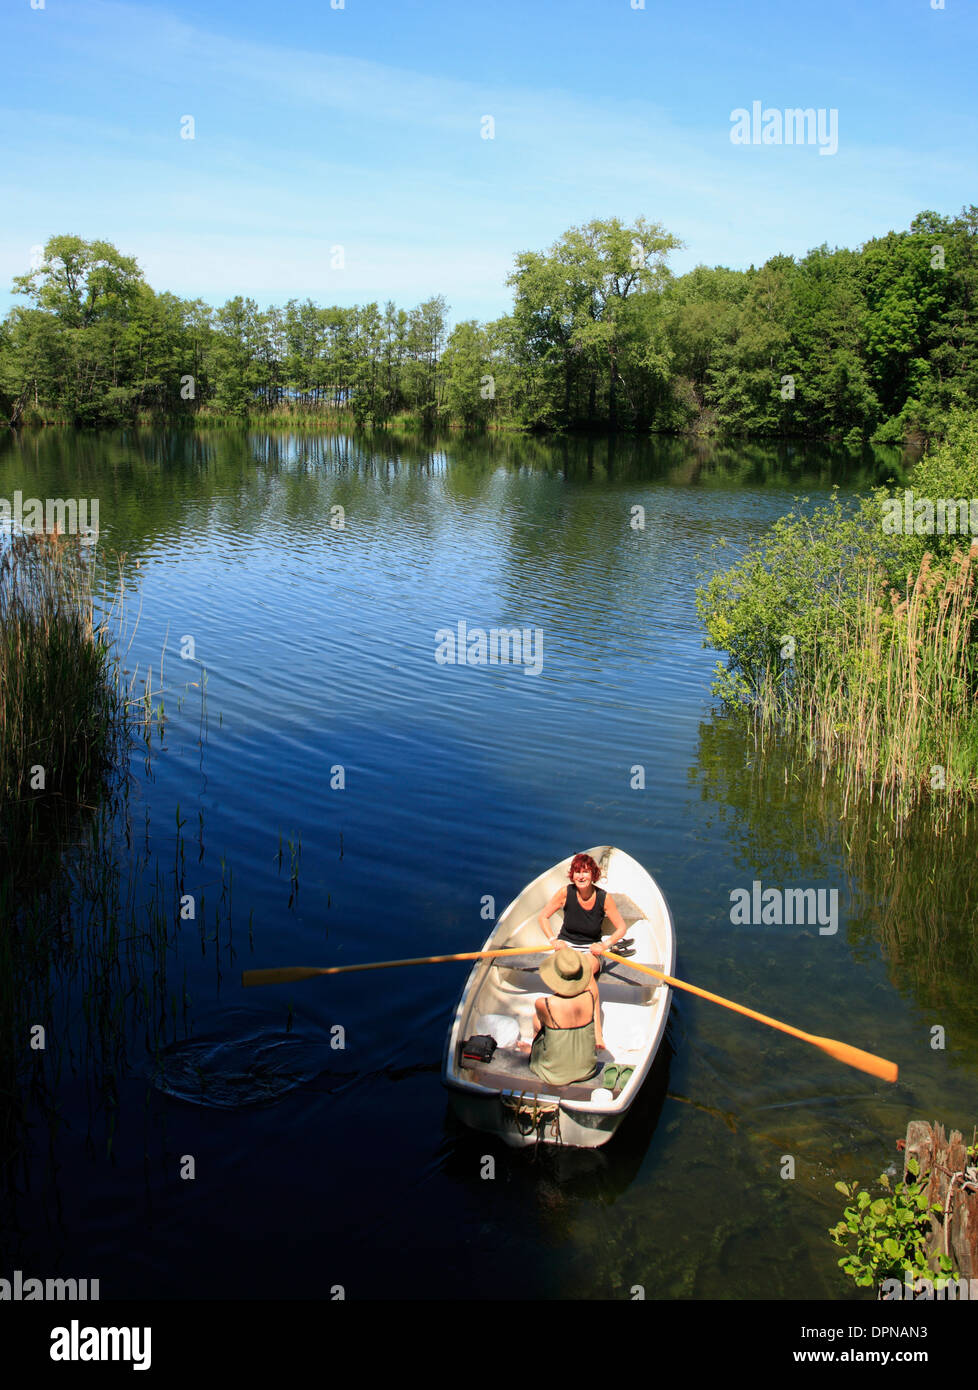 Lago Schaalsee, vogatore vicino Lassahn, Meclemburgo-Pomerania, Germania, Europa Immagini Stock